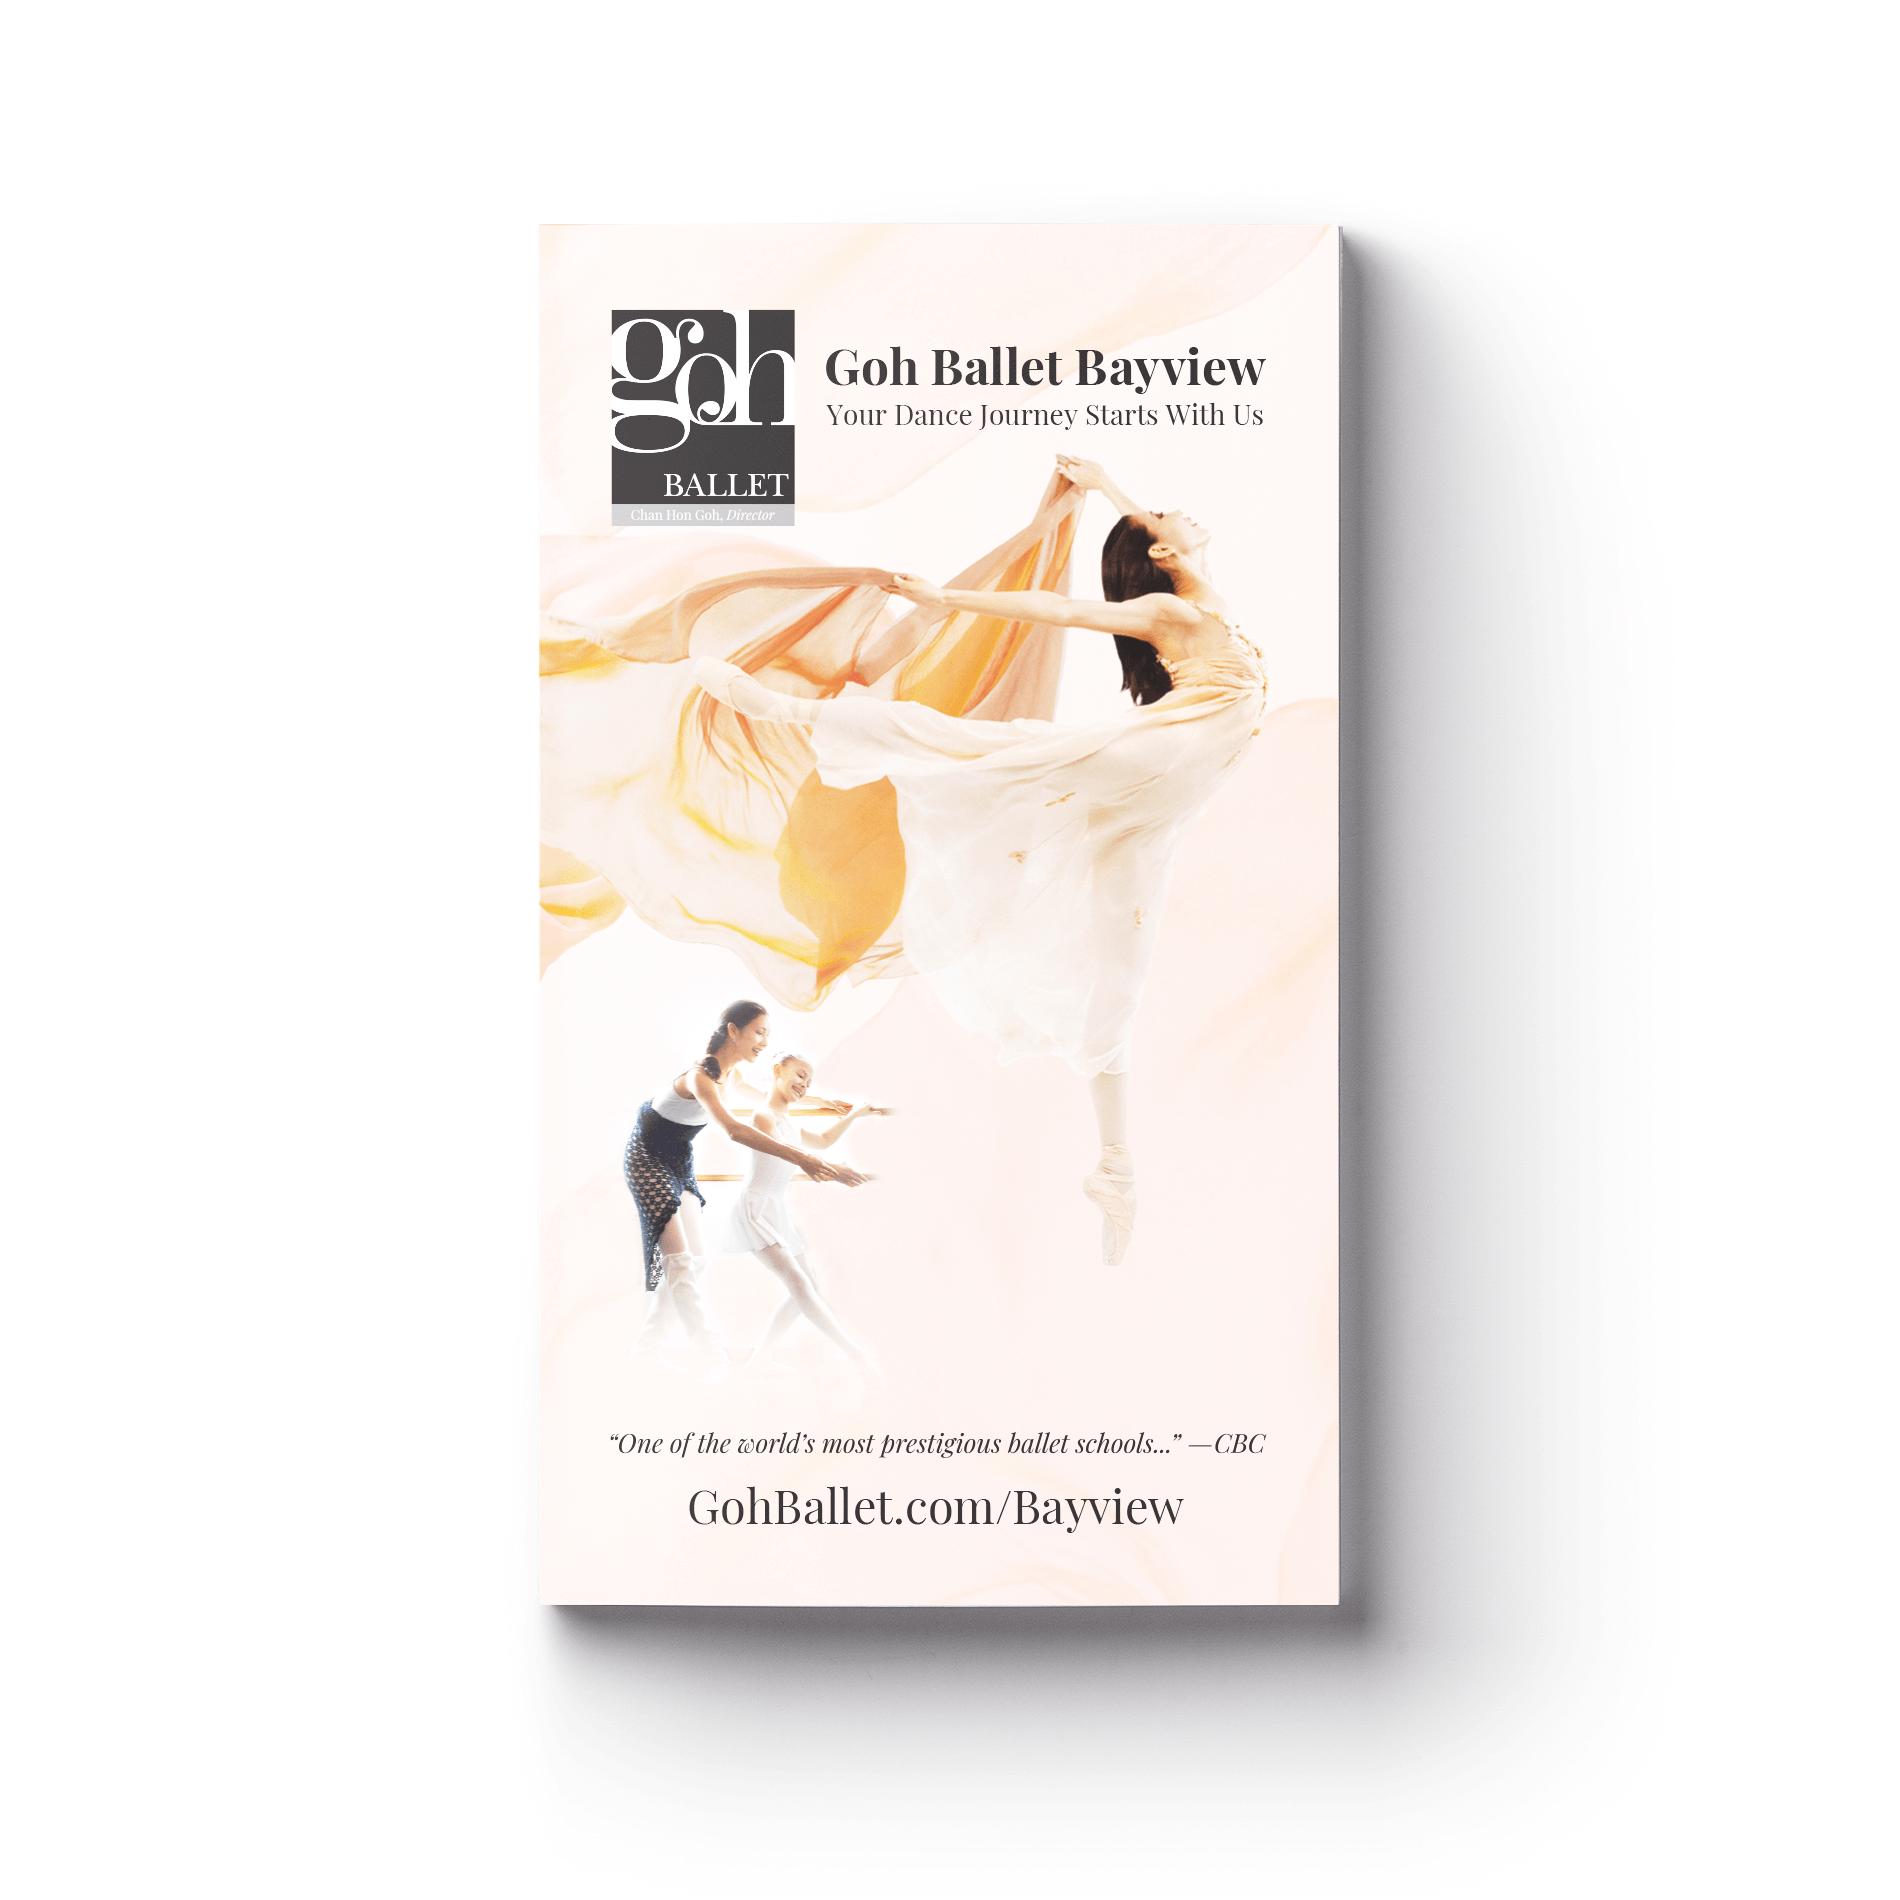 Goh Ballet Bayview English Brochure